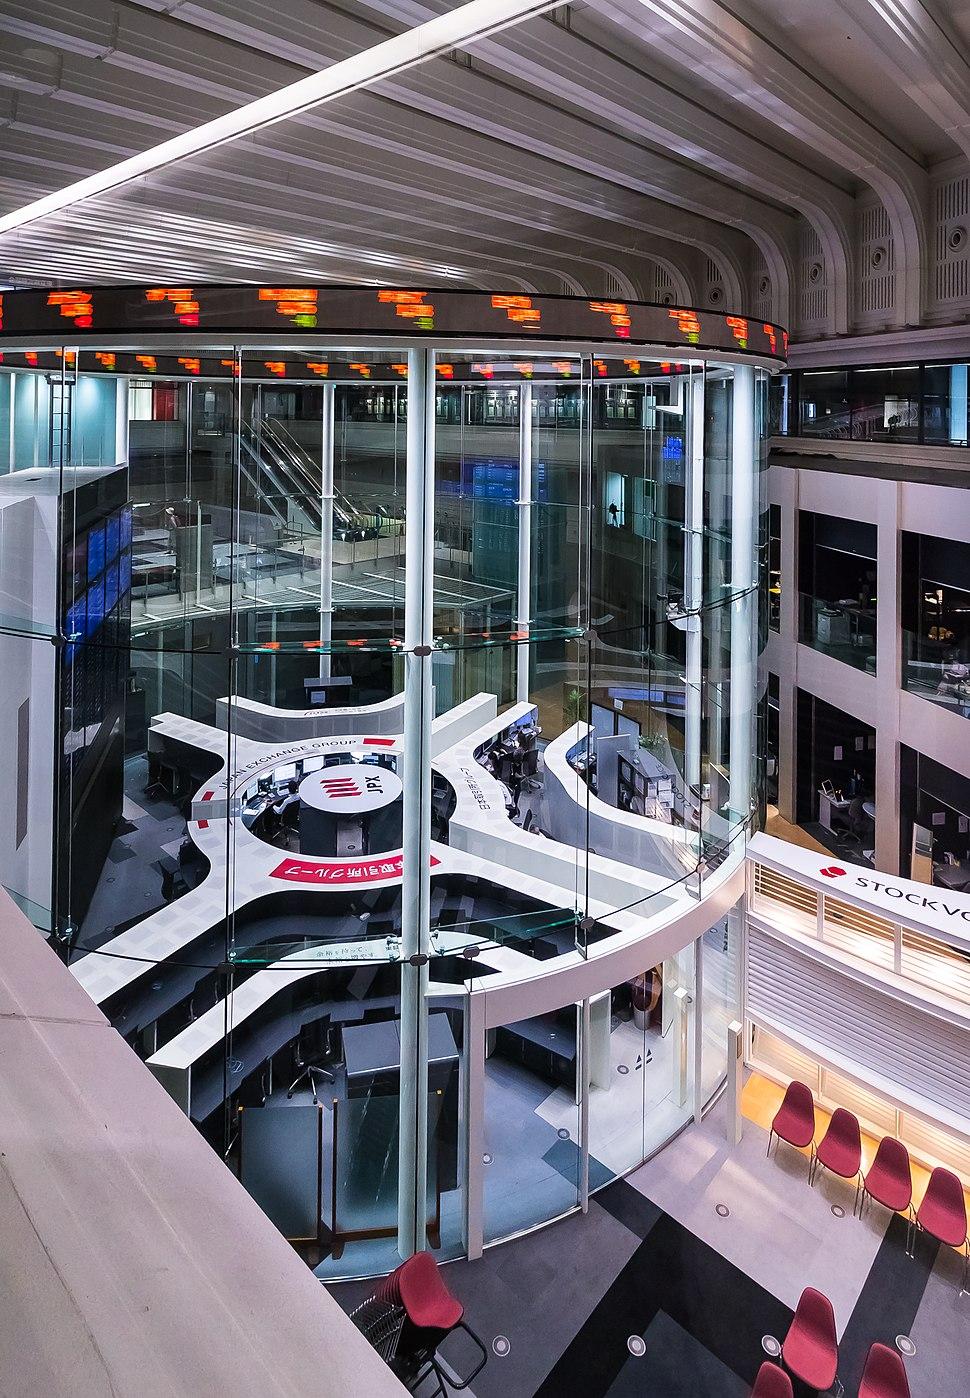 The Tokyo Stock Exchange - main room 3